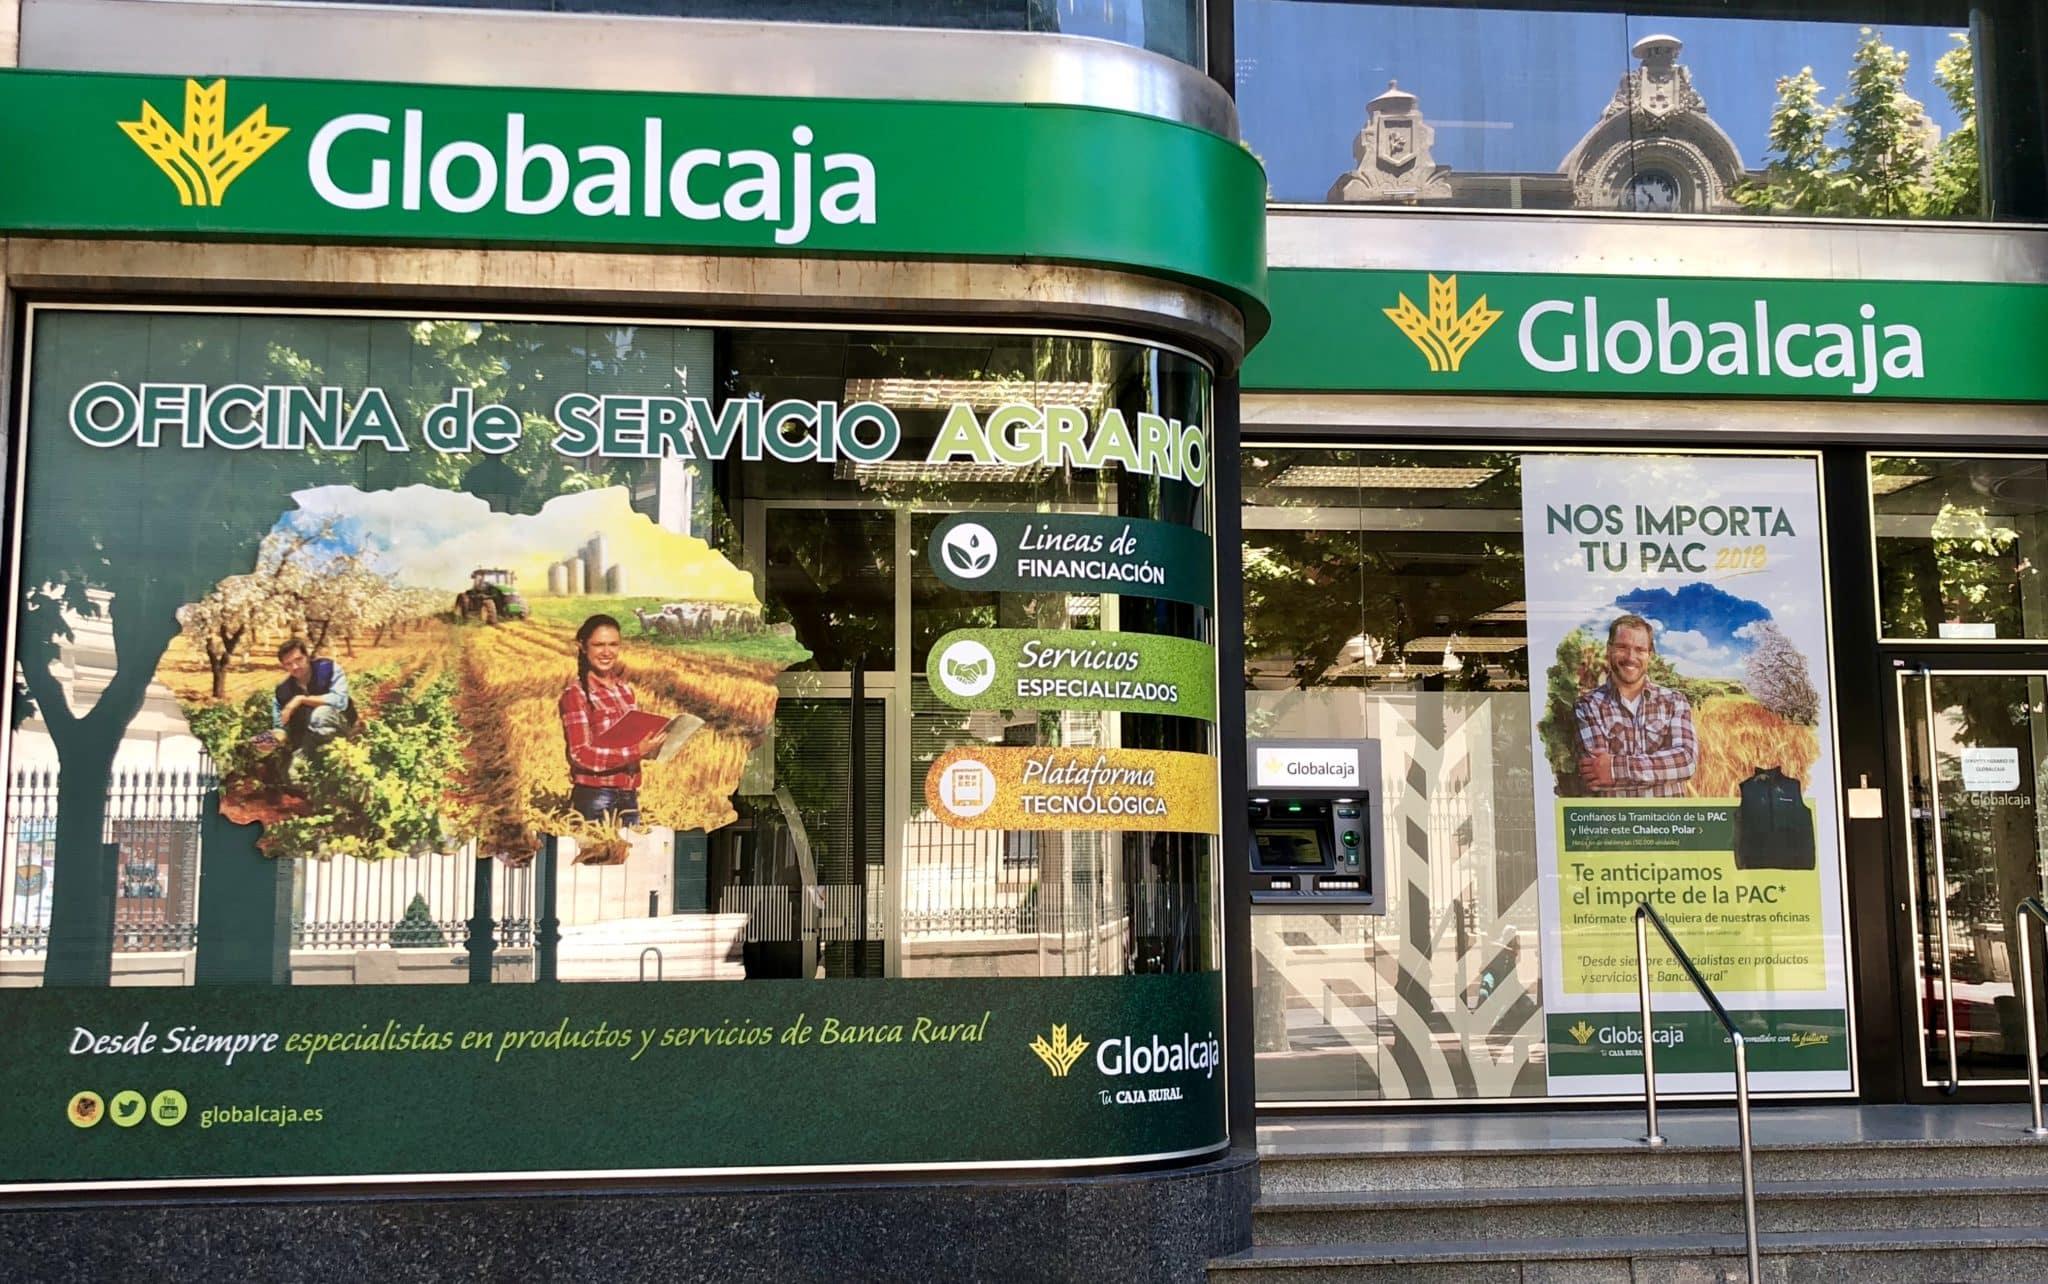 https://blog.globalcaja.es/wp-content/uploads/2018/07/IMG_5171-1.jpg